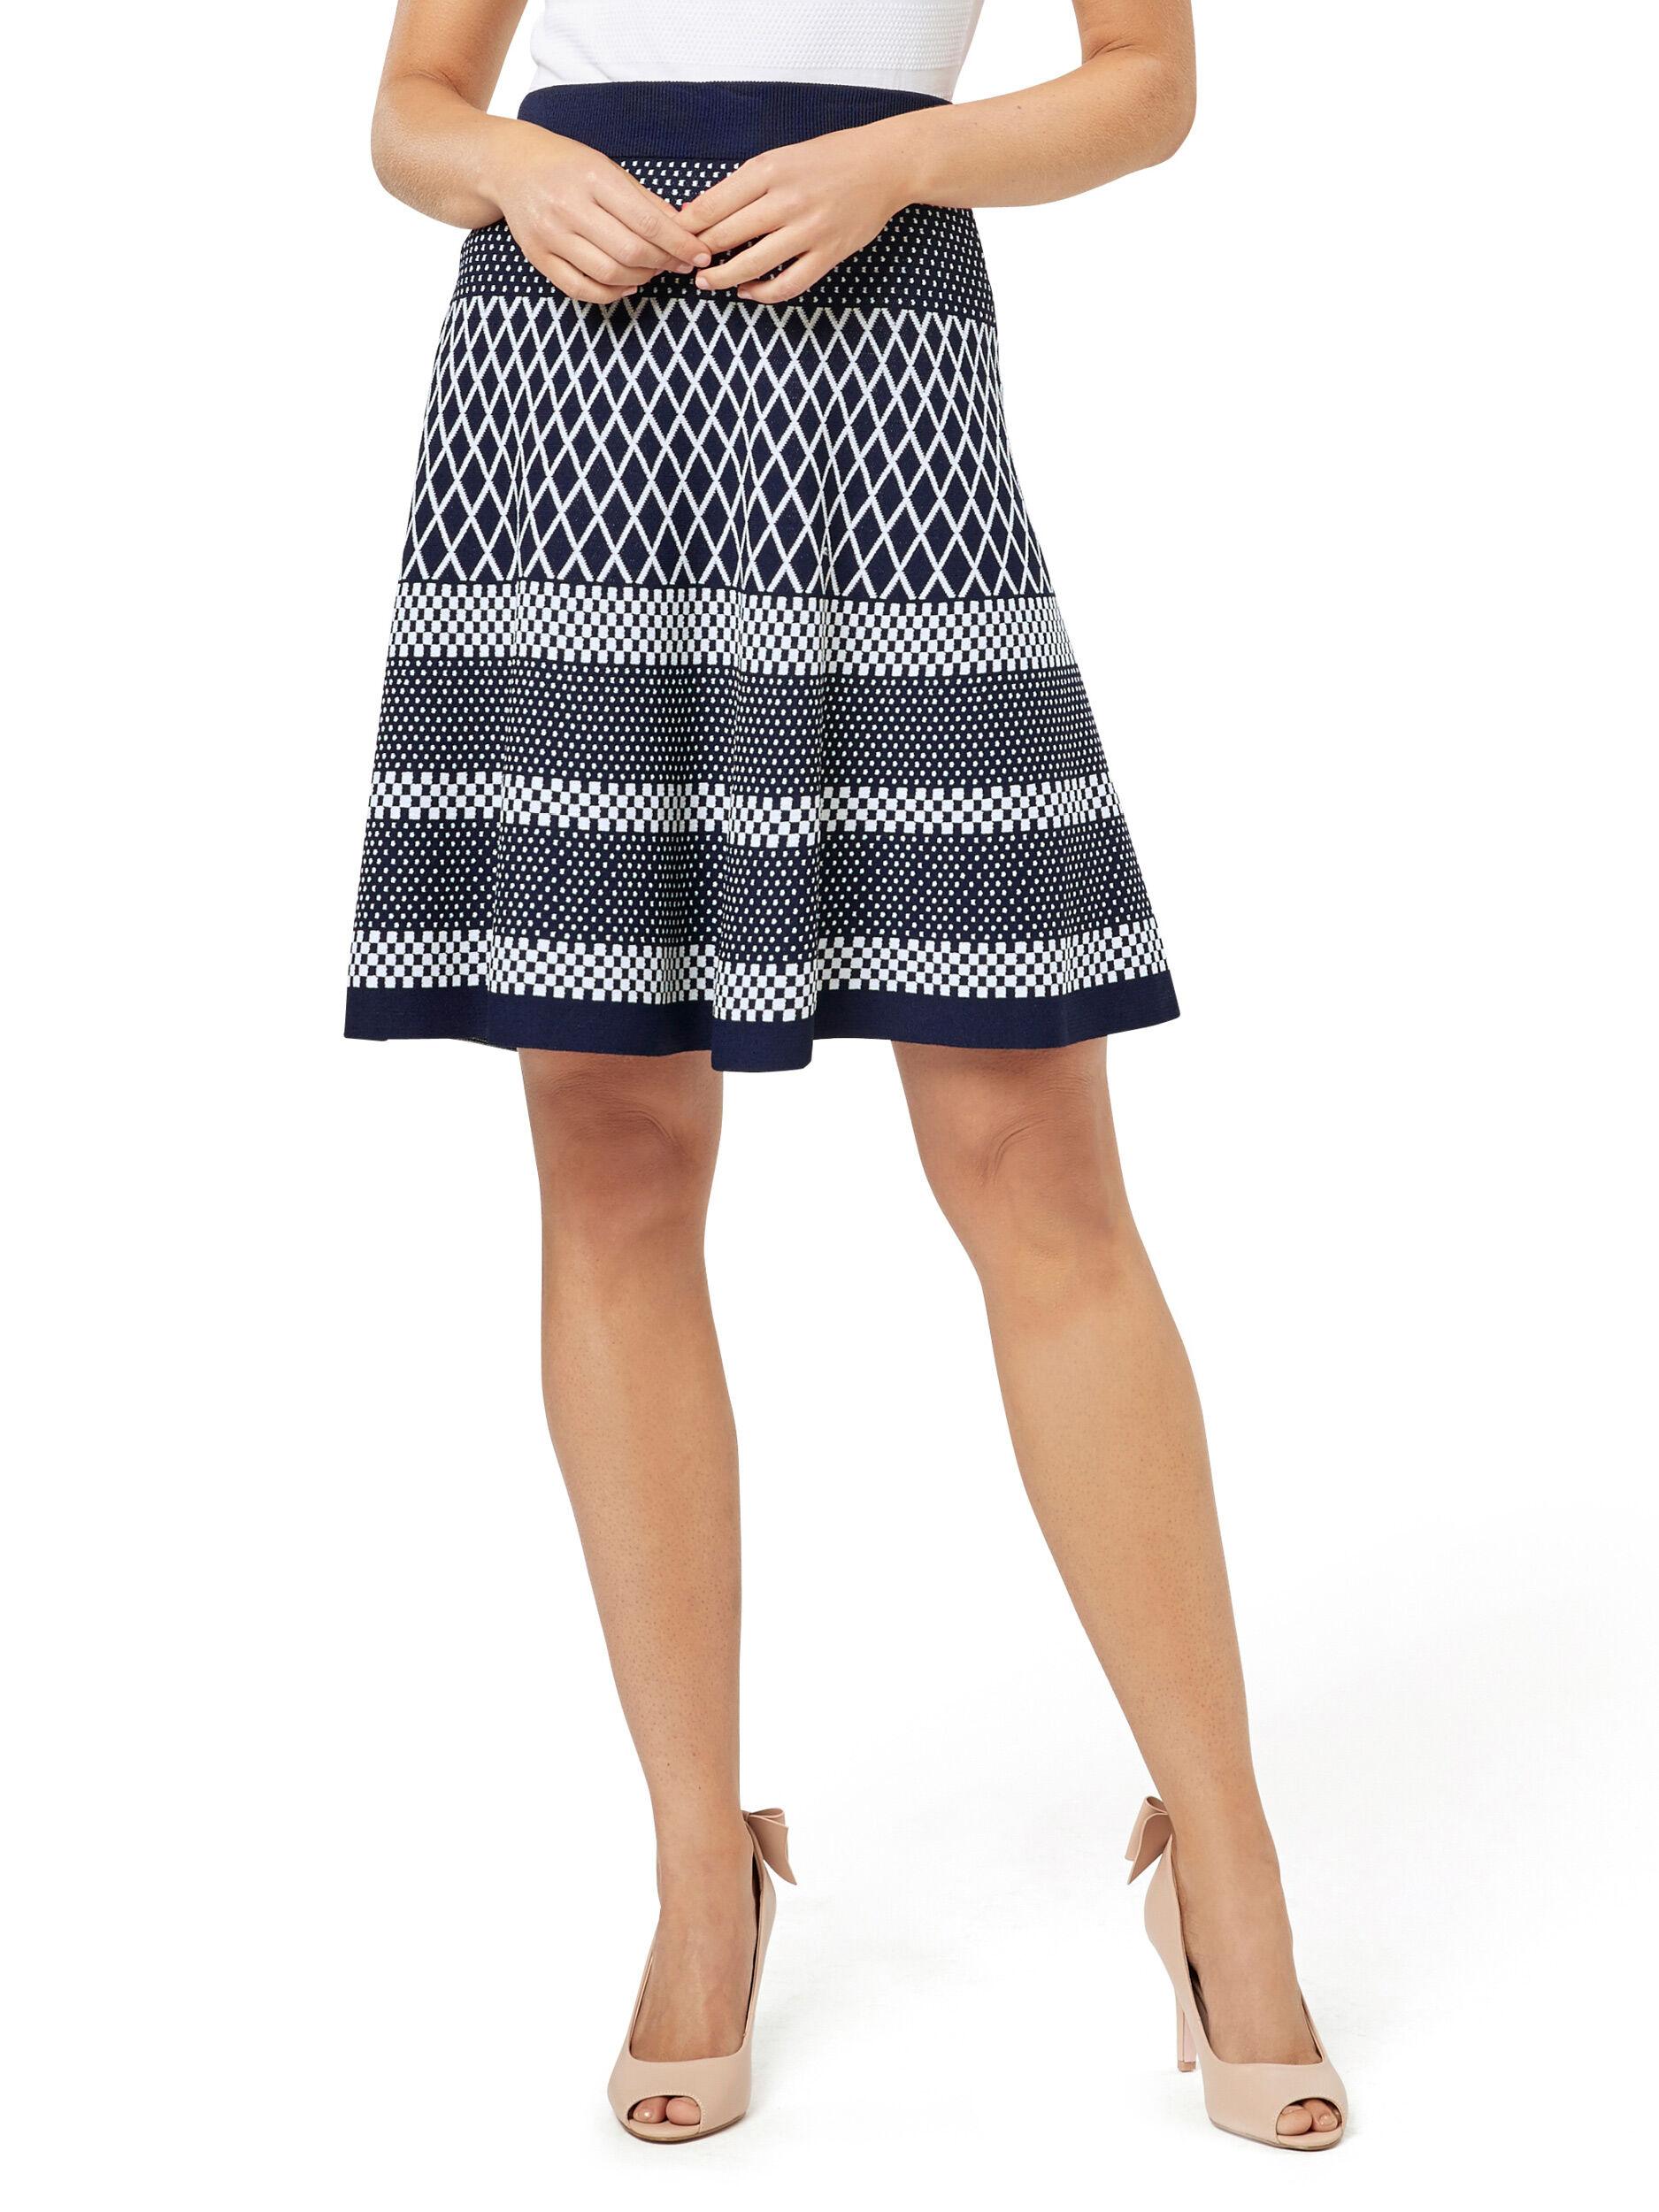 Cleo Knit Skirt